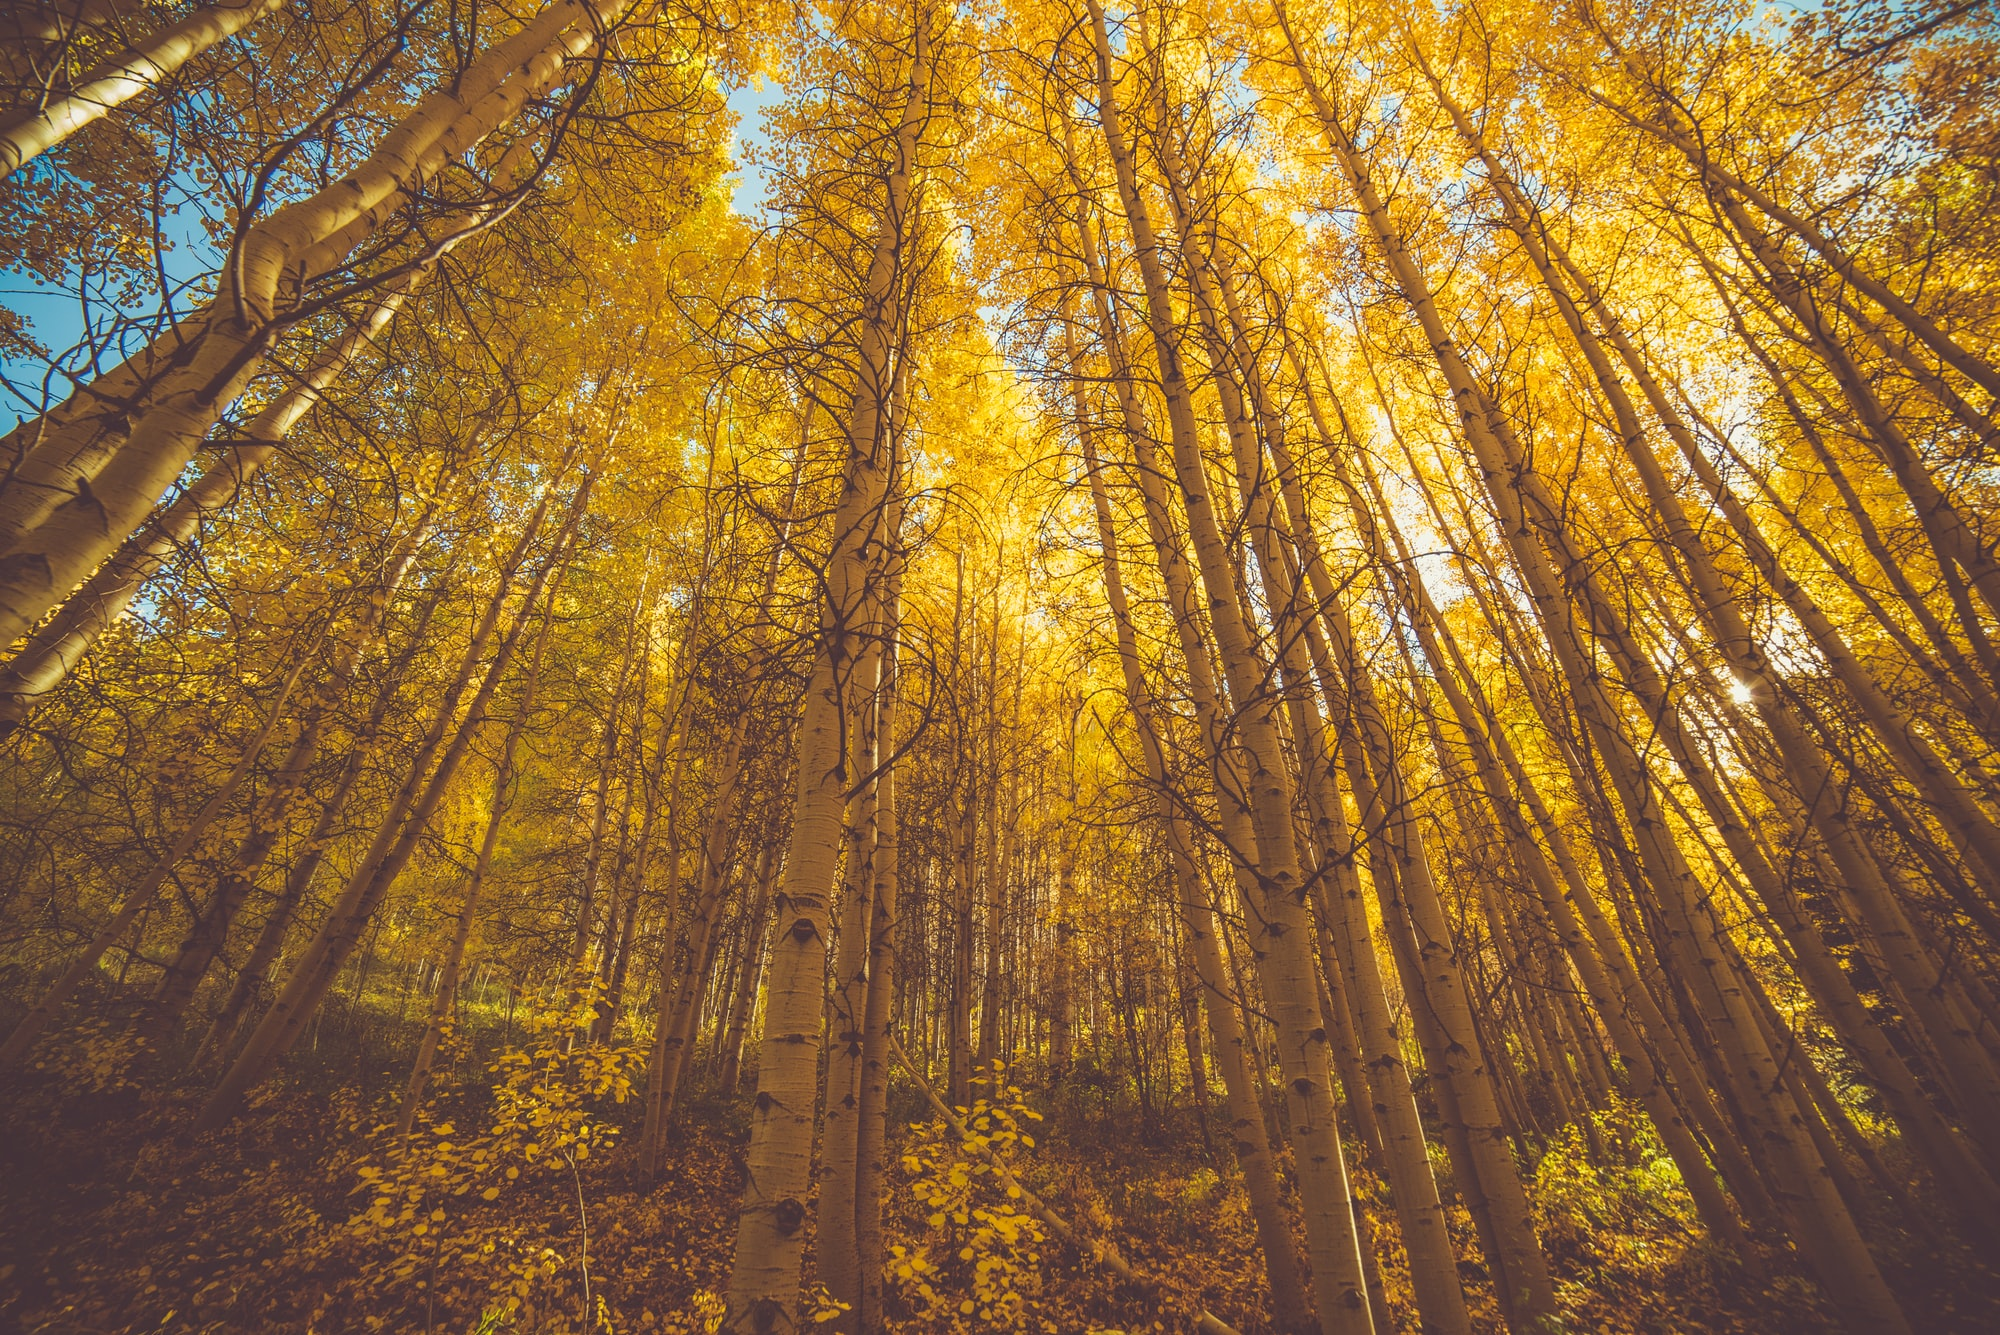 Fire bærekraftige fond [og en portefølje] du kan investere i